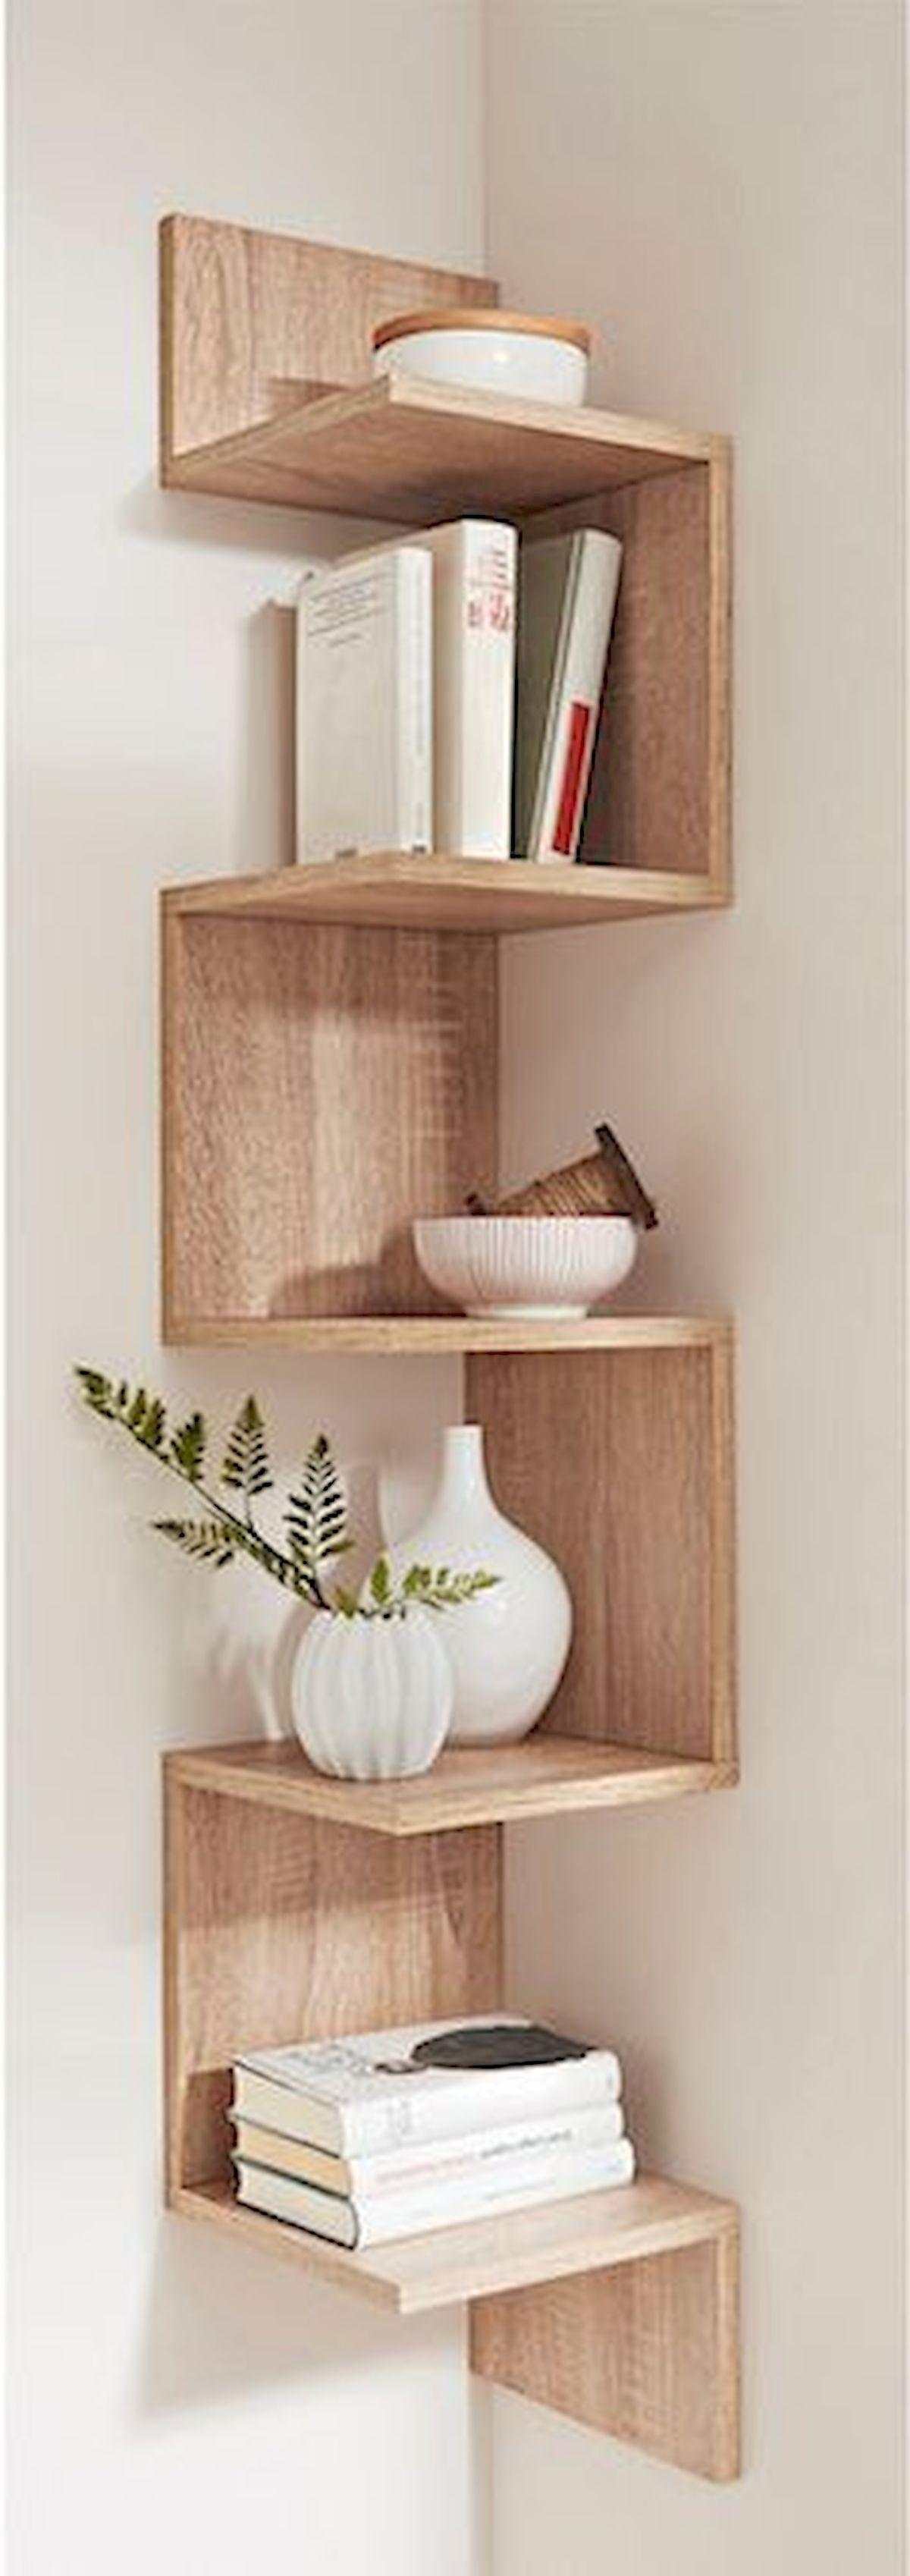 Bathroom Corner Shelf Unit: Inspiring DIY Farmhouse Home Decorating Idea